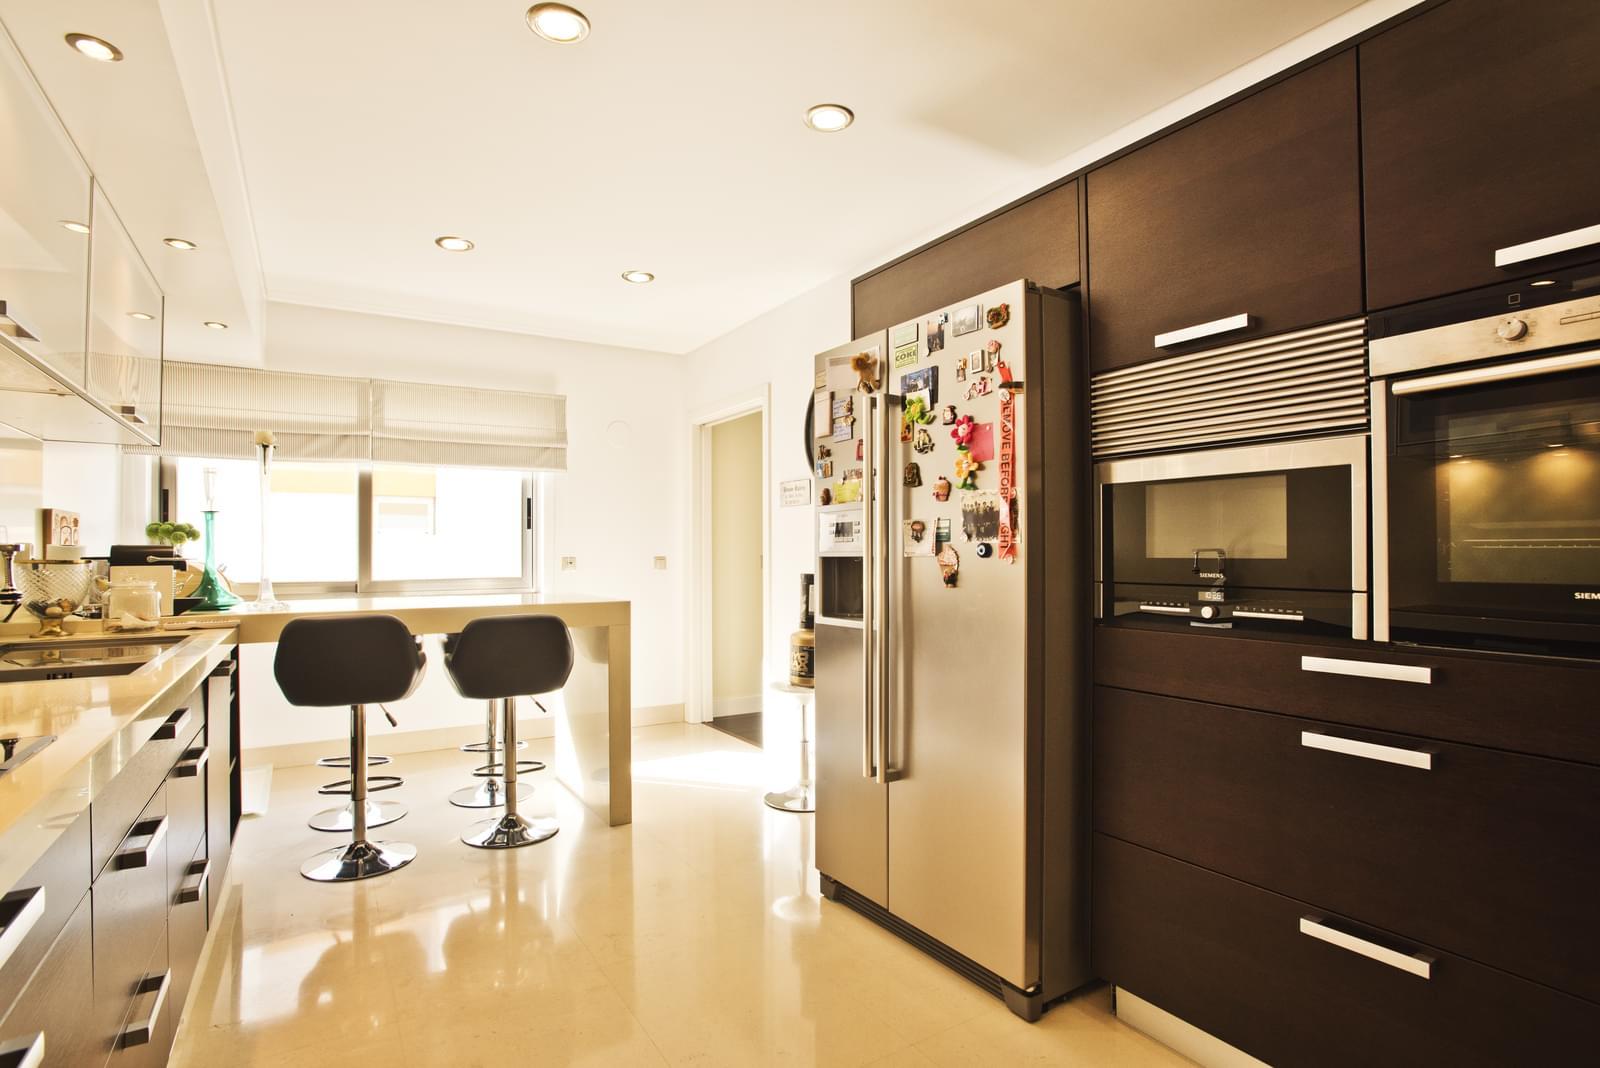 pf16902-apartamento-t3-cascais-26c102ab-e18f-43f0-9f59-5adf75c9ba62